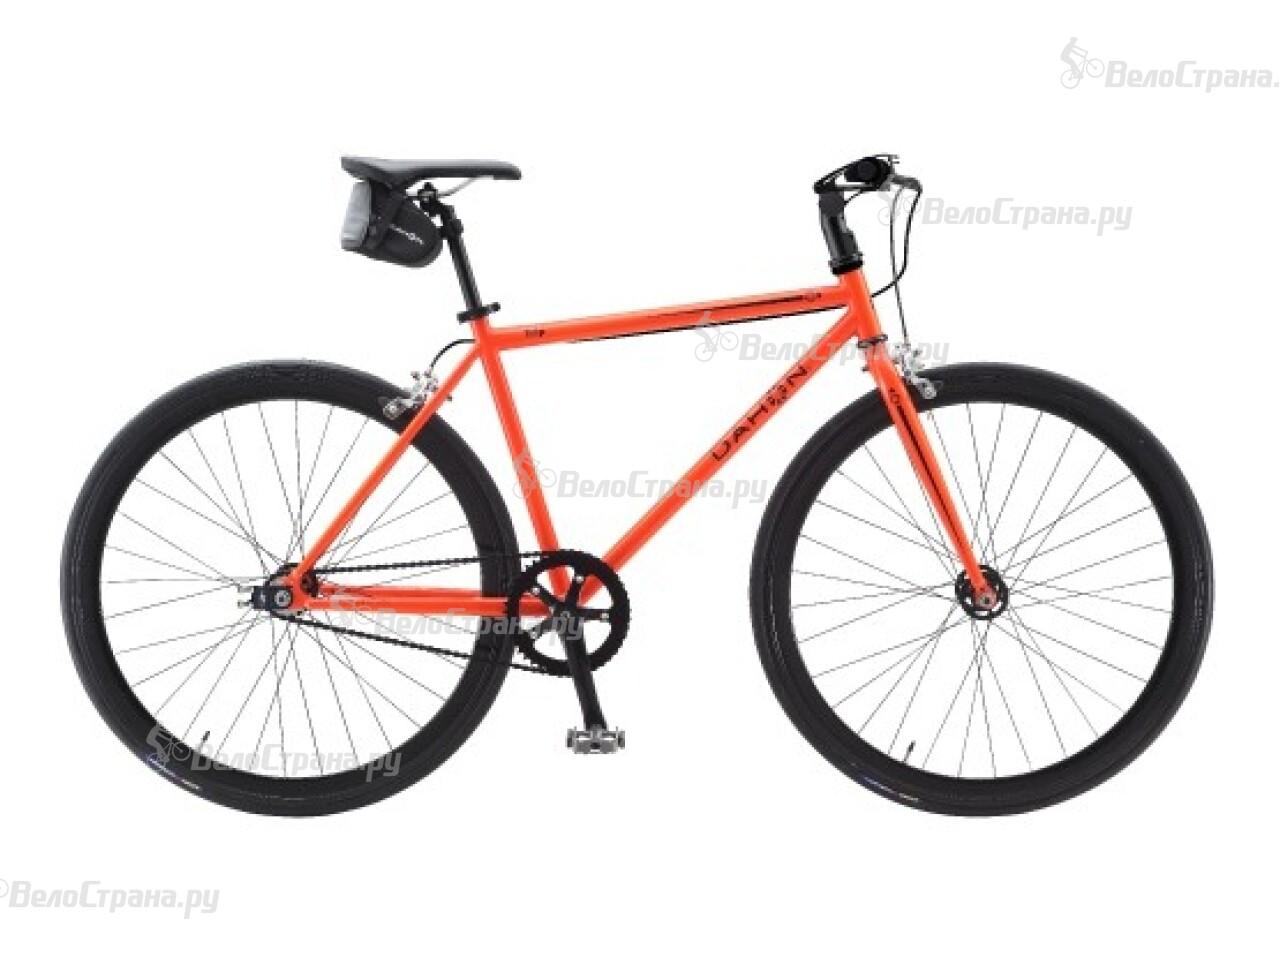 все цены на Велосипед Dahon Trip Uno (2015) онлайн